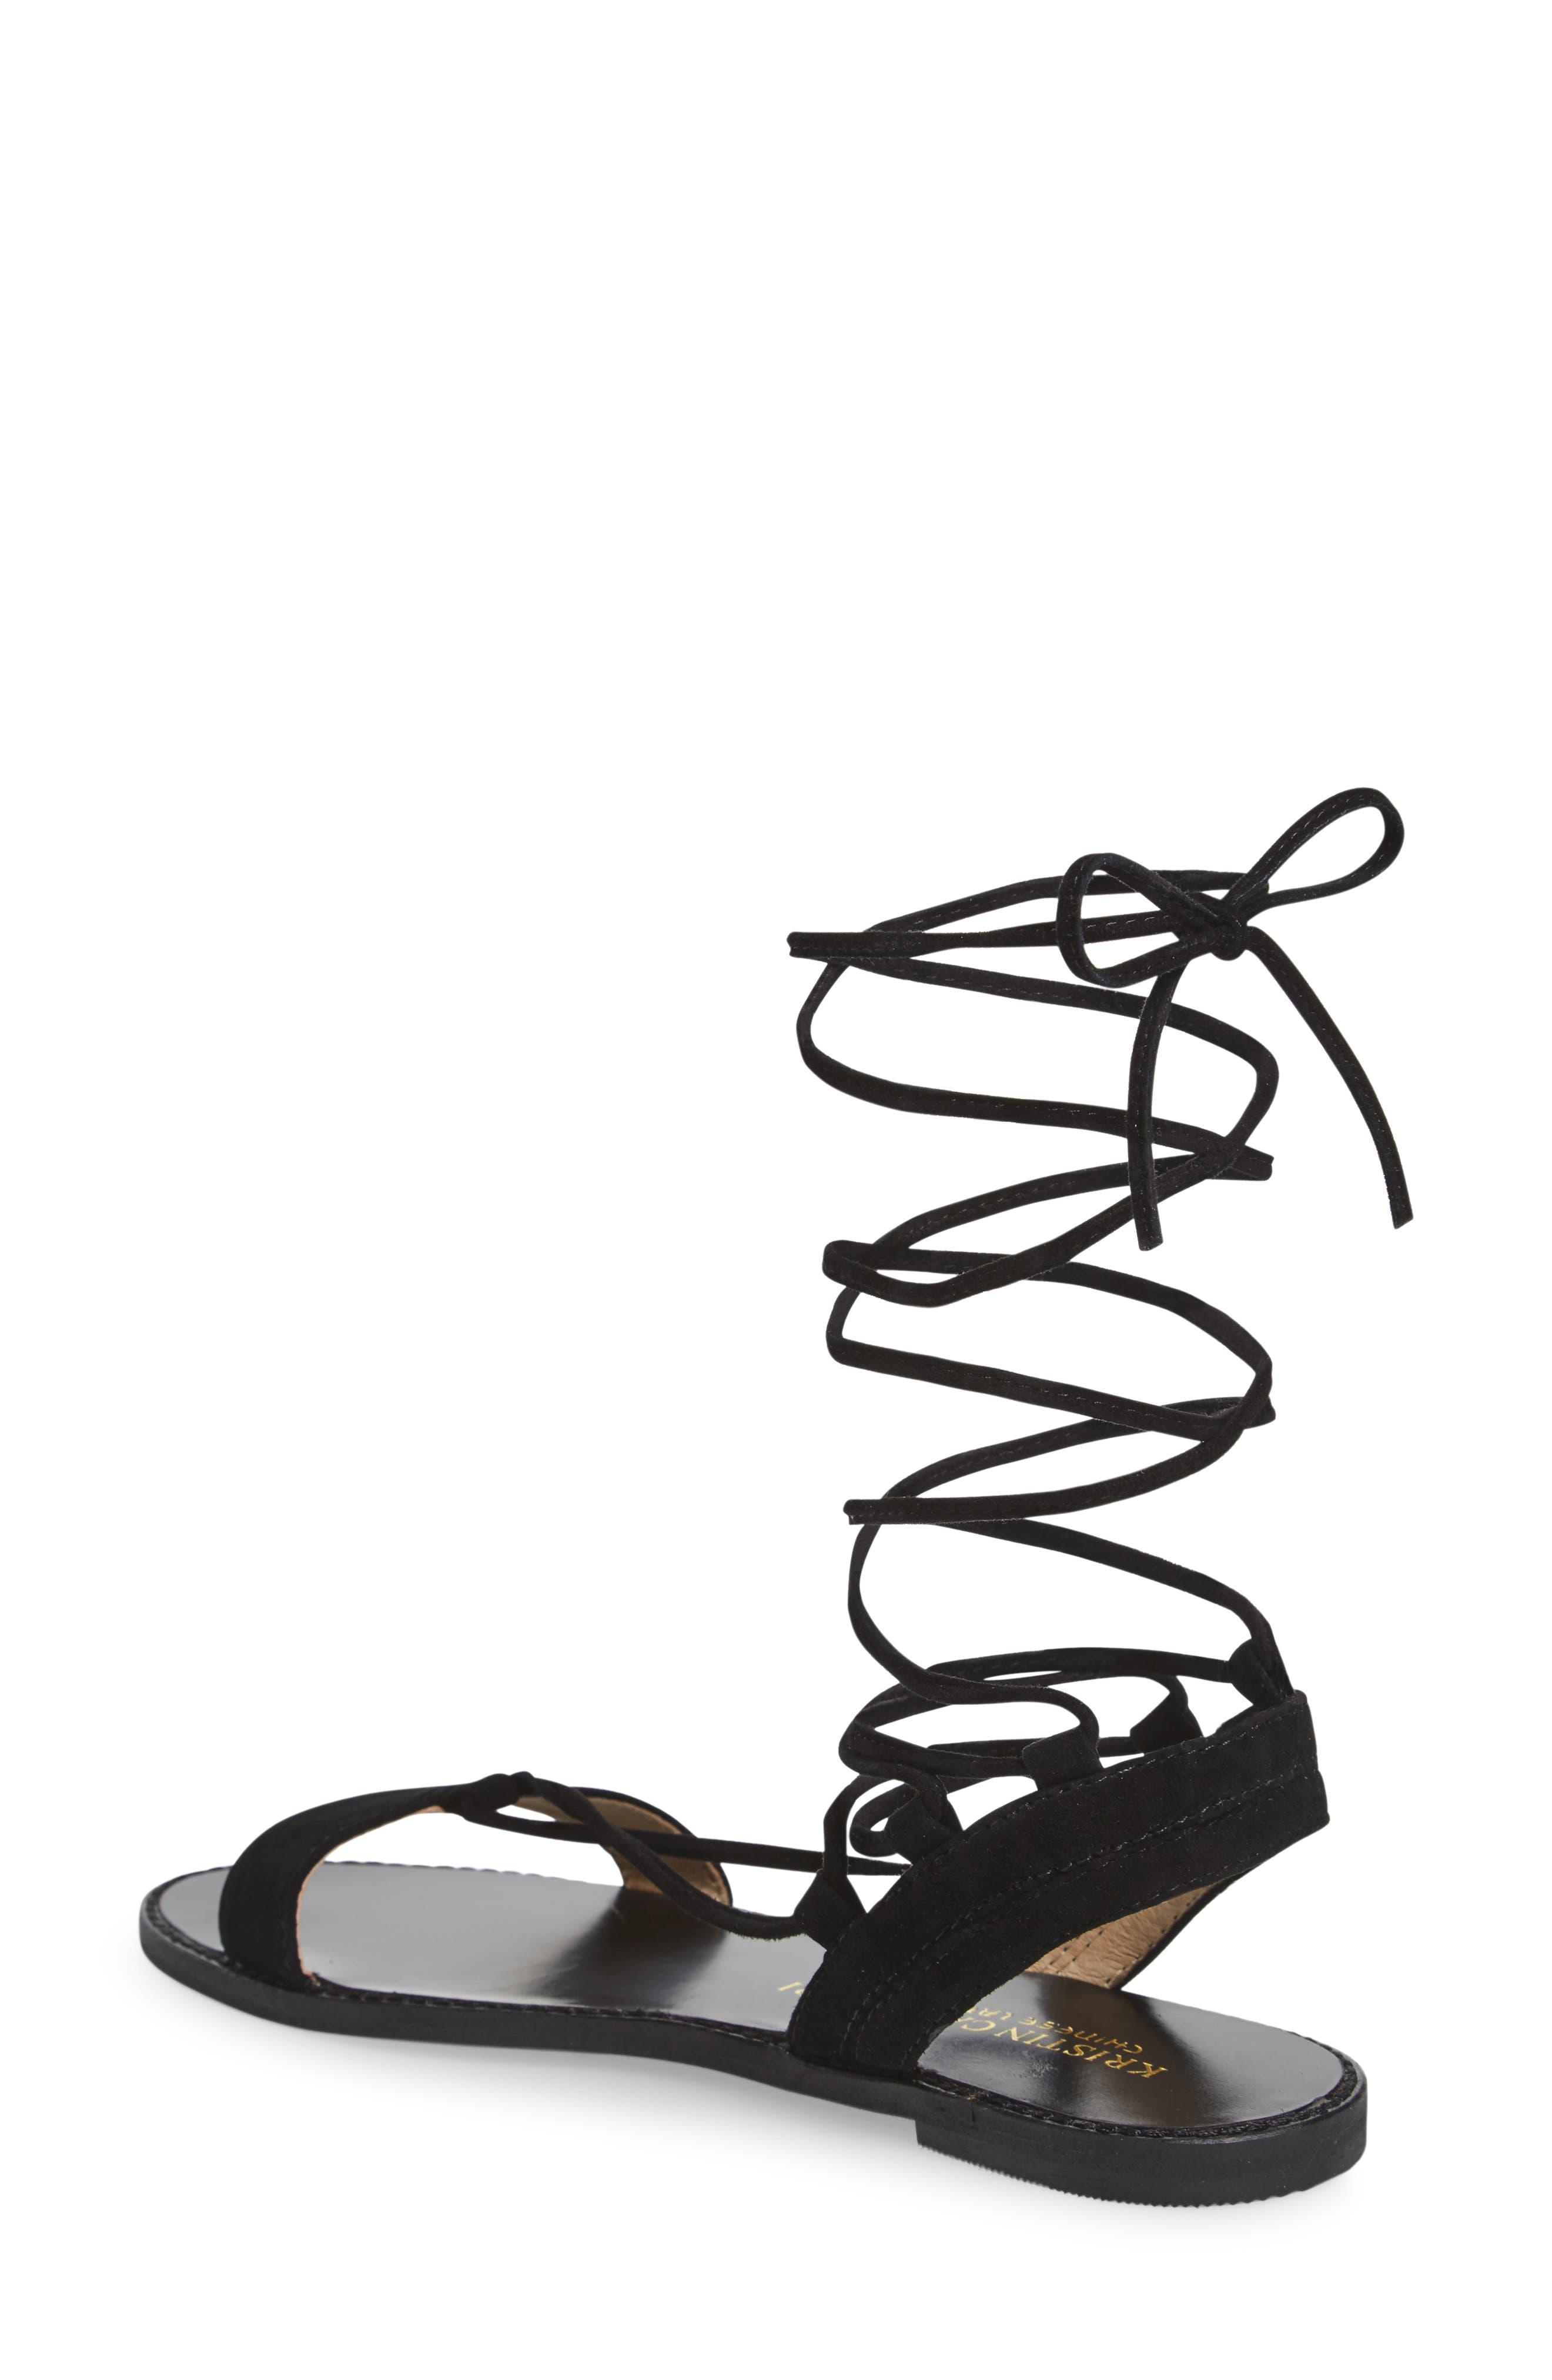 Brea Ankle Wrap Sandal,                             Alternate thumbnail 3, color,